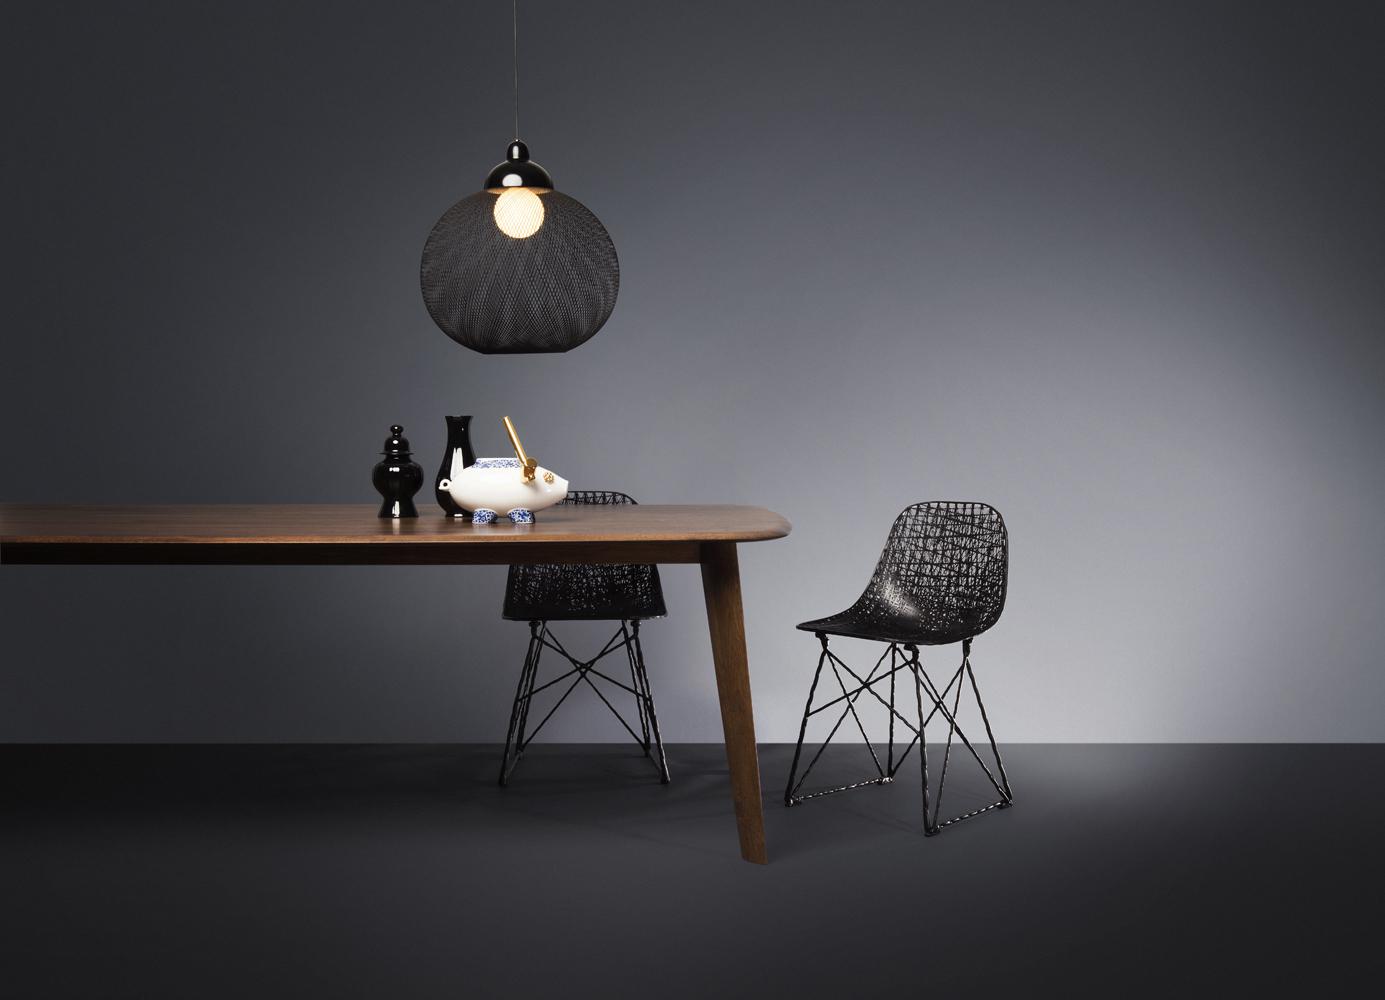 moooi non random suspension light buy from campbell watson uk. Black Bedroom Furniture Sets. Home Design Ideas